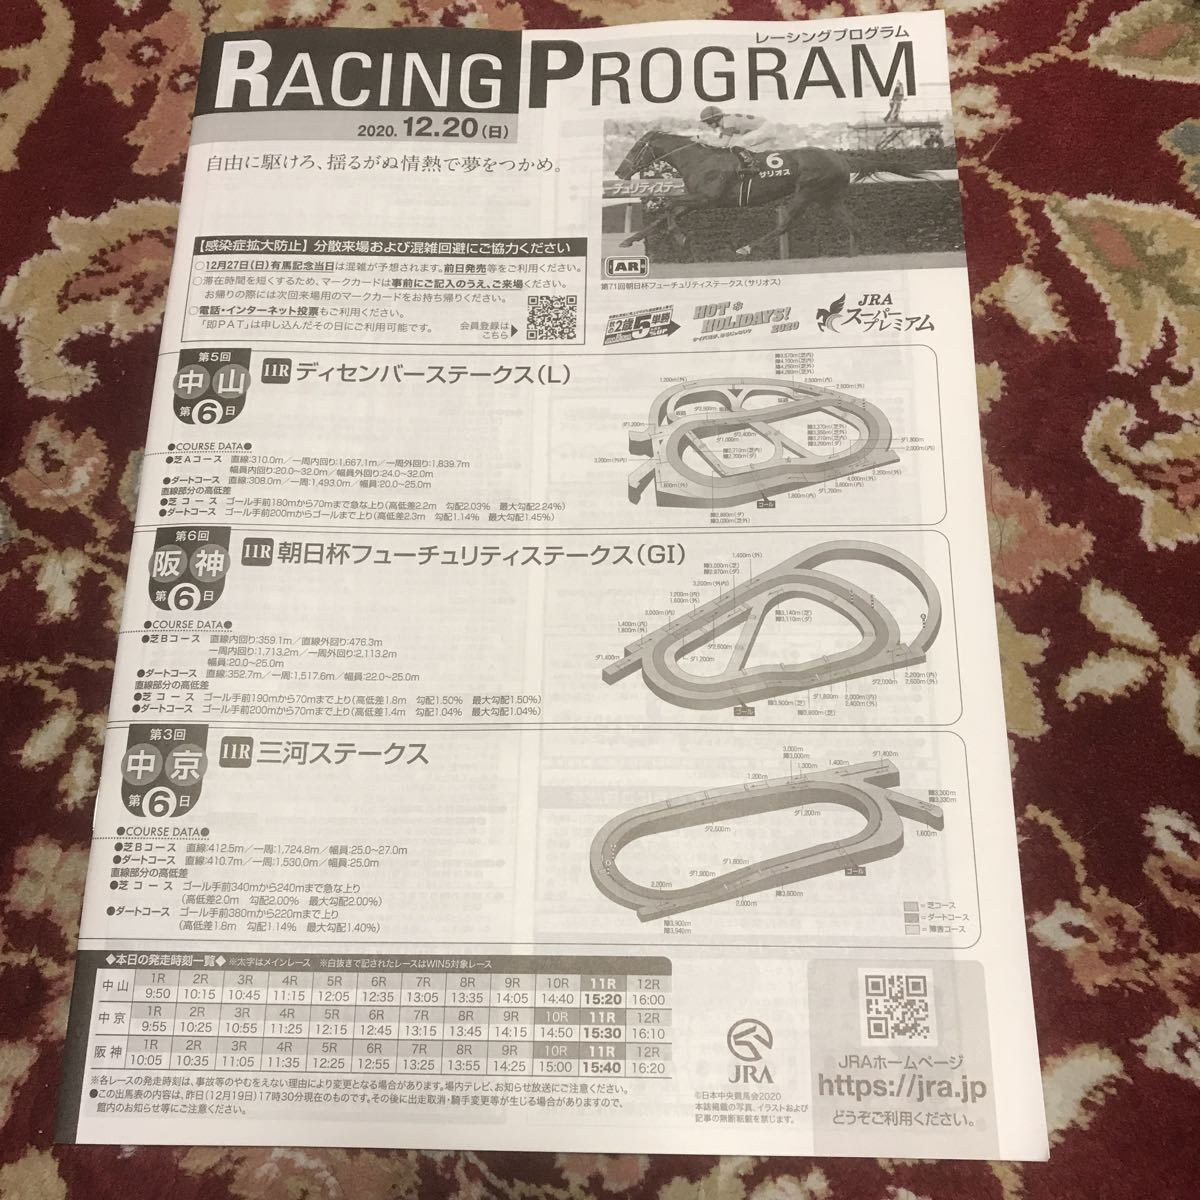 JRAレーシングプログラム2020.12.20(日)朝日杯フューチュリティステークス(GⅠ)、ディセンバーステークス(L)、三河ステークス_画像1